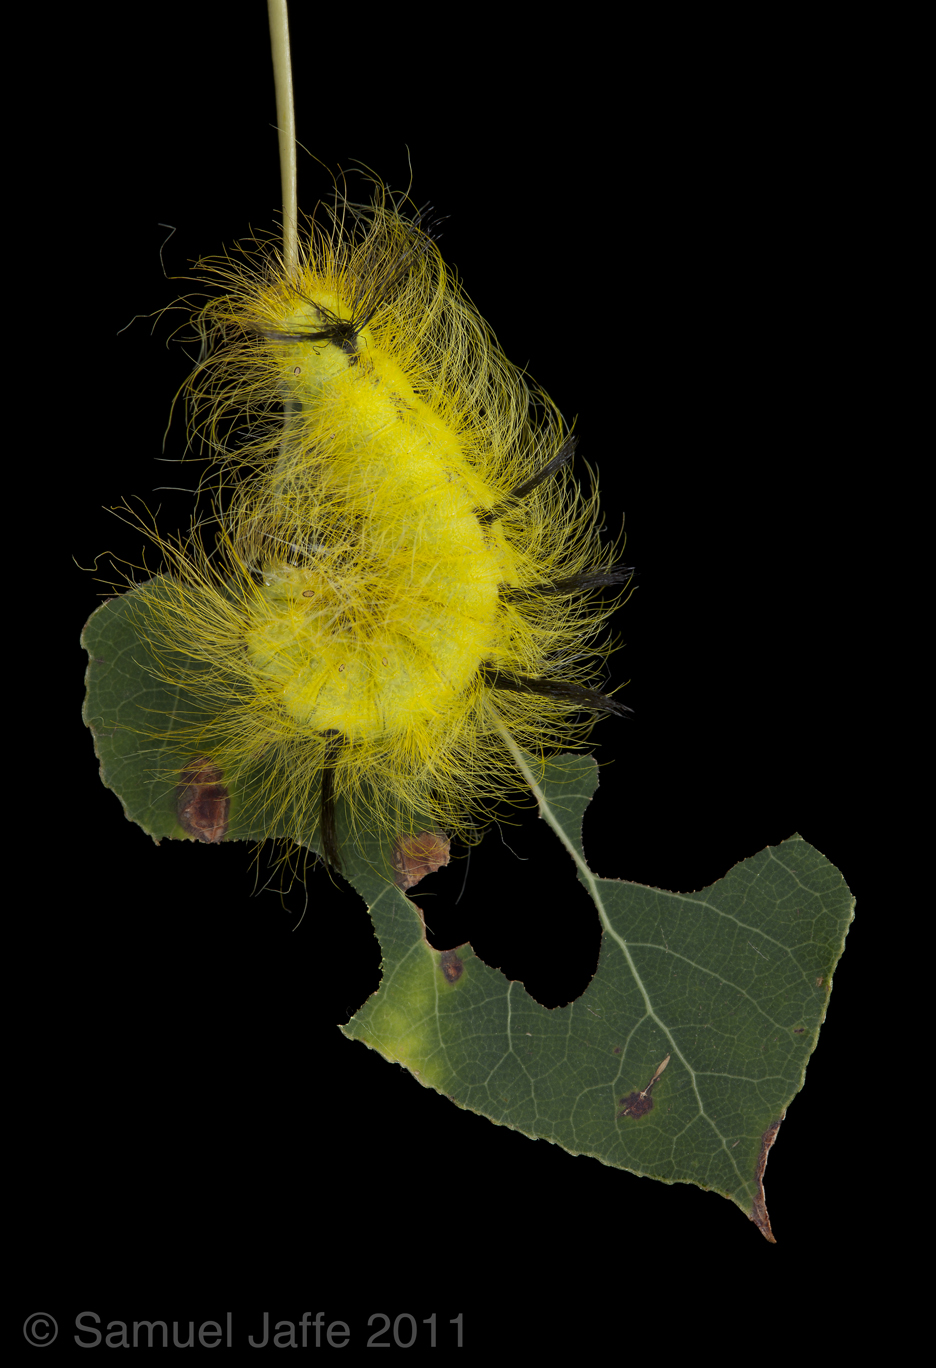 Acronicta lepusculina - Cottonwood Dagger